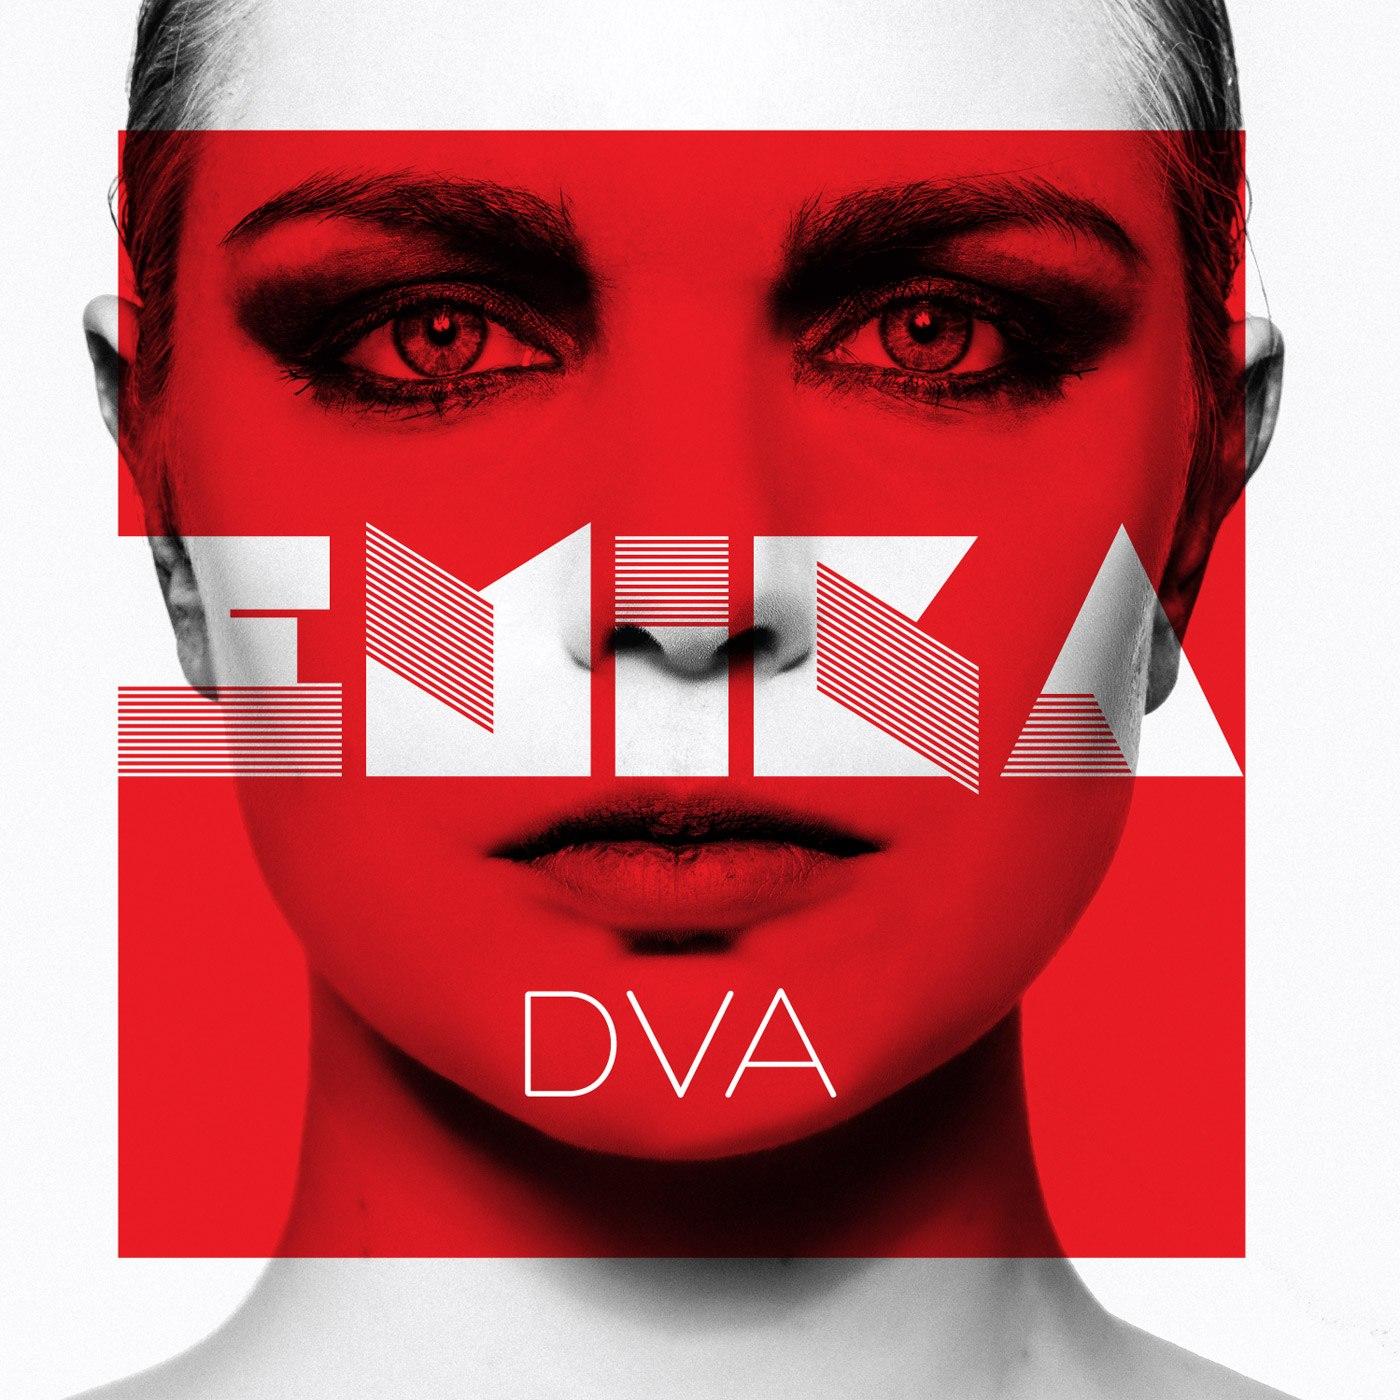 "Emikas neues Album ""DVA"" kommt im Juni auf Ninja Tune"